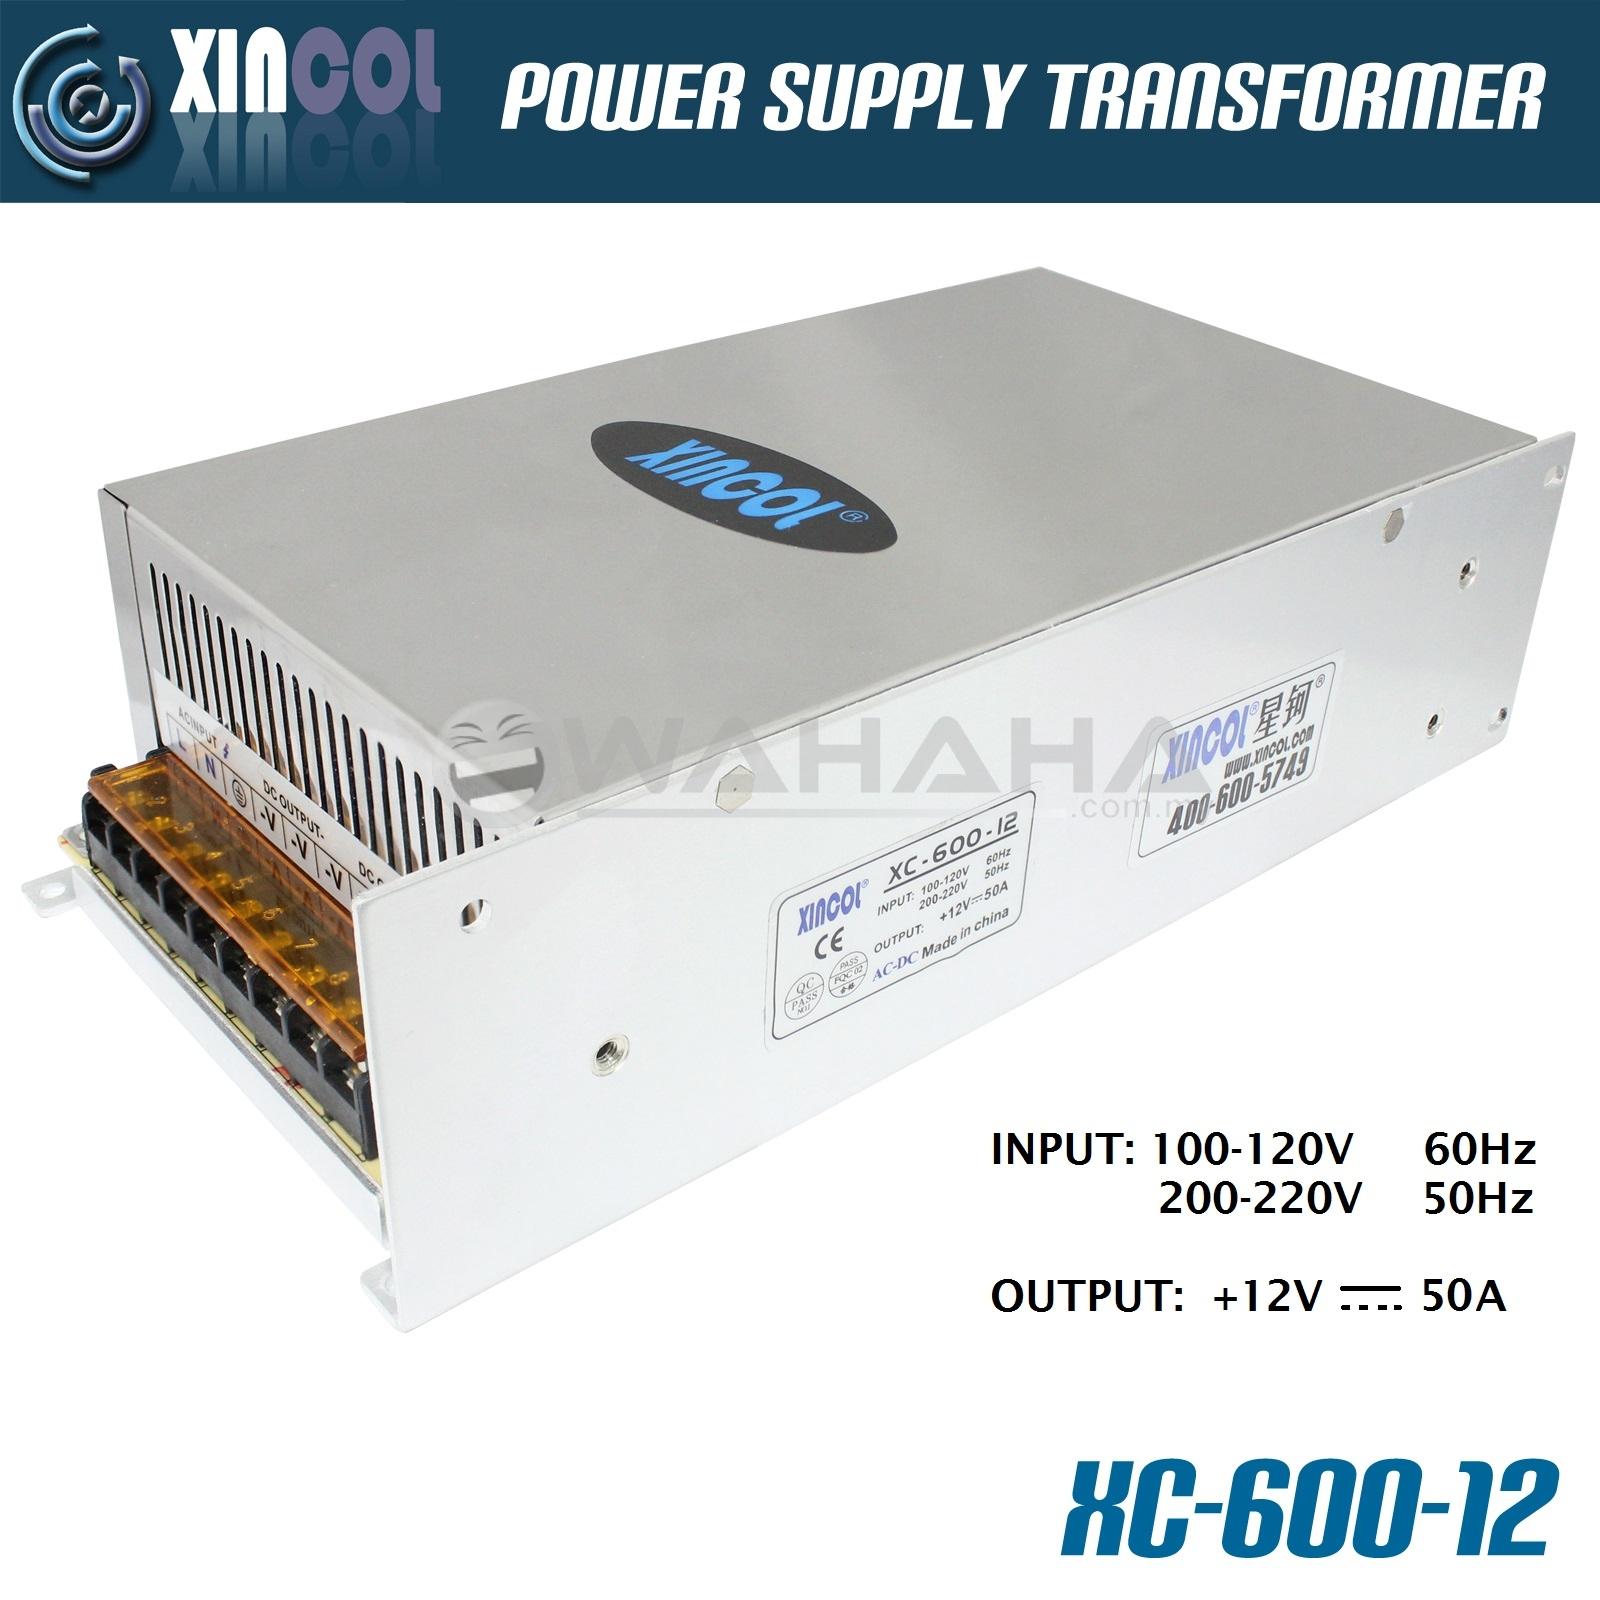 12 Volt 50A DC Power Supply Transfo (end 12/10/2019 4:15 PM)